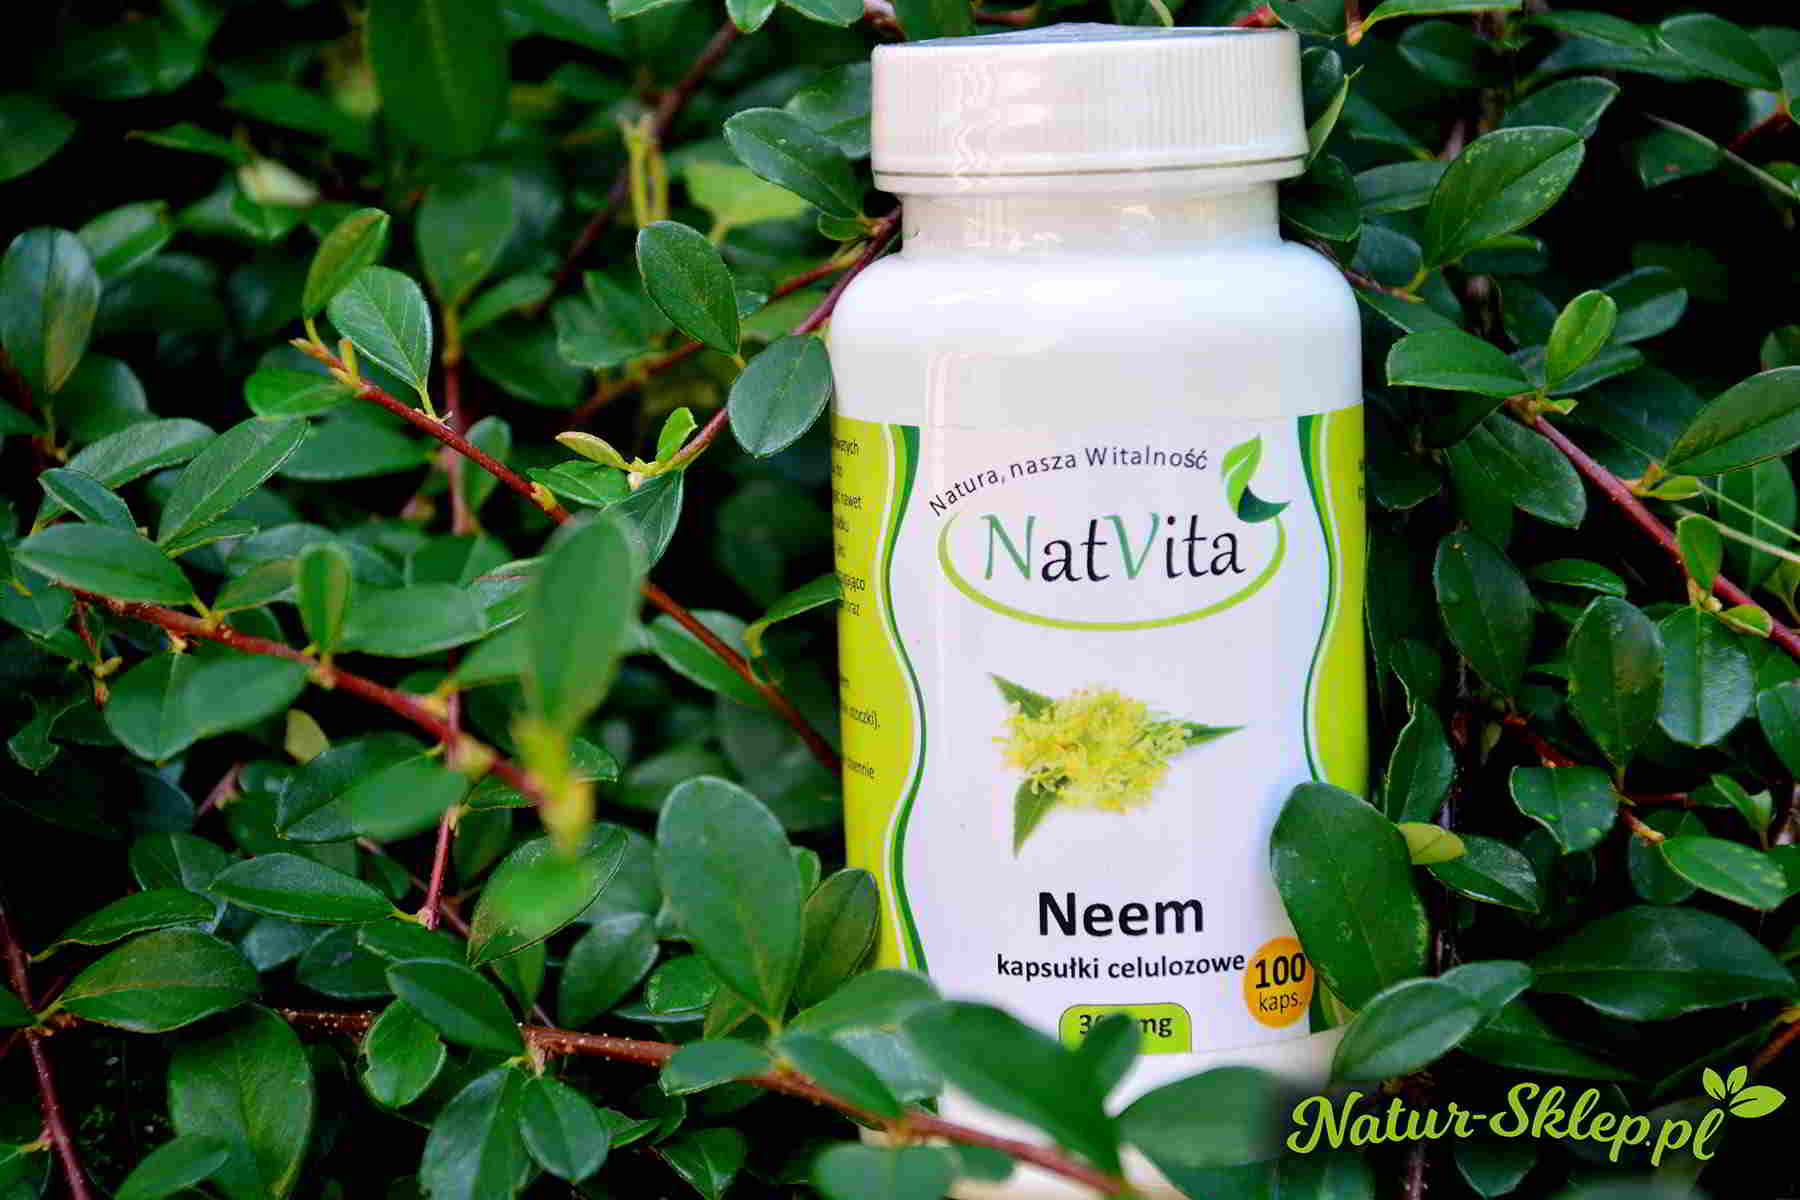 Kapsułki neem na tle roślin